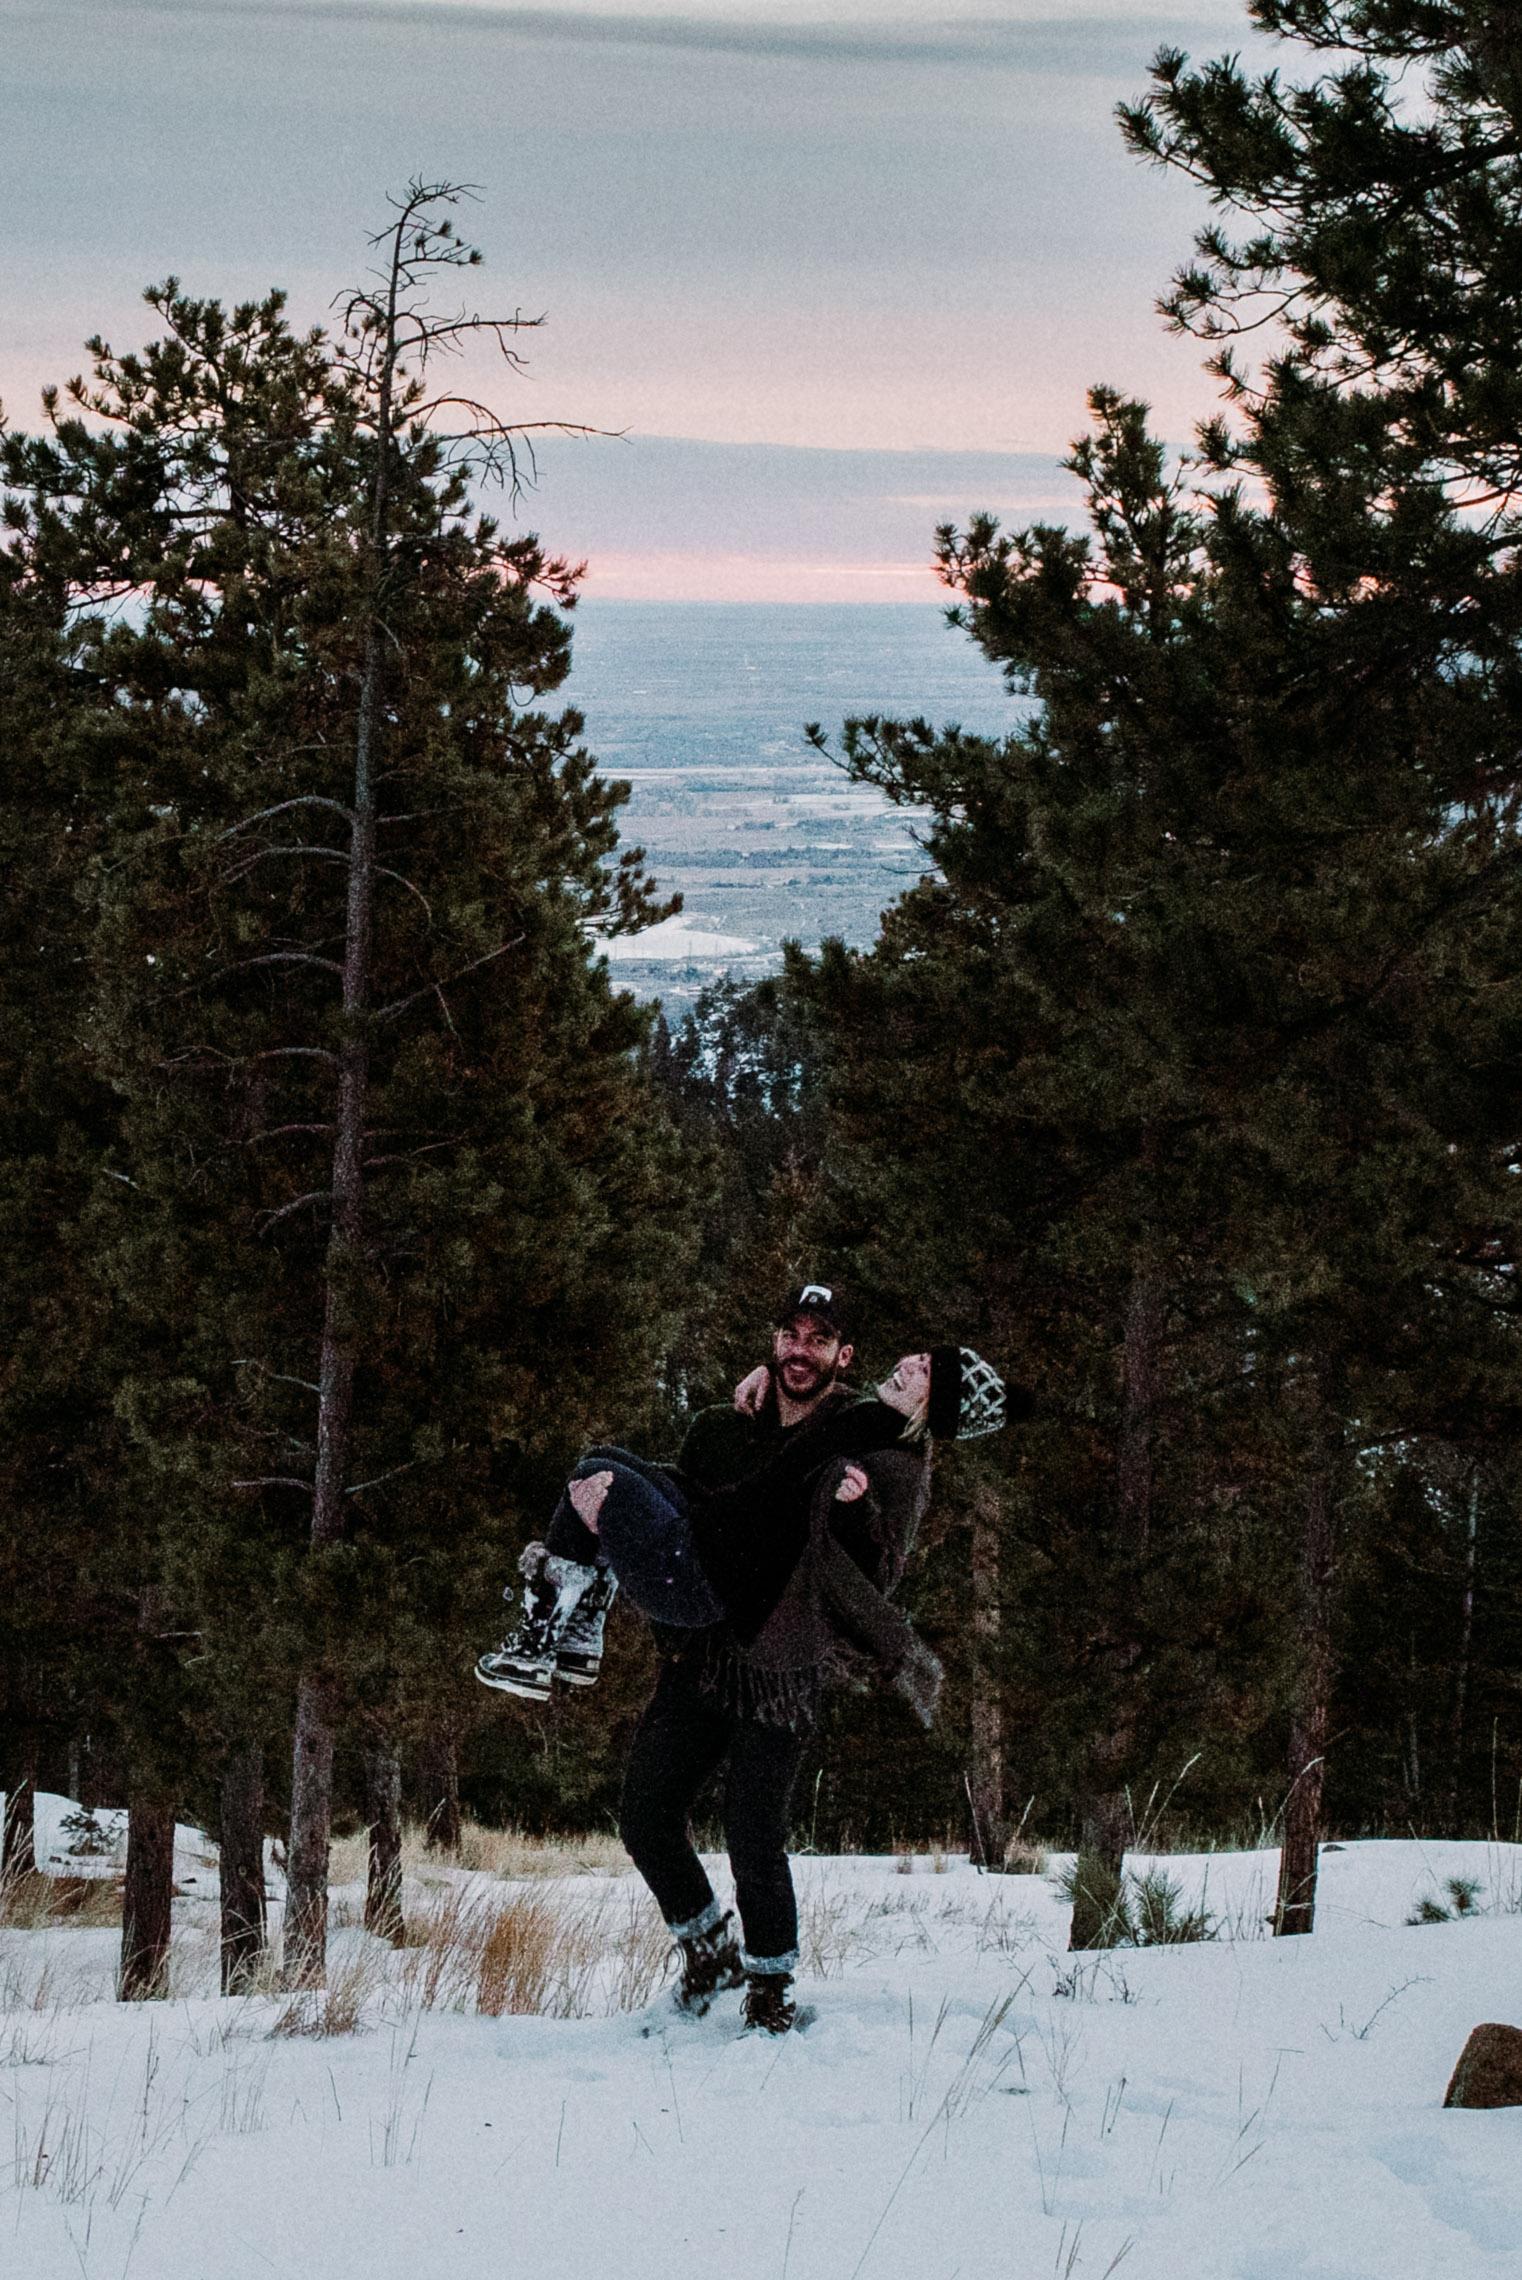 Flagstaff Mountain at Sunrise- January 2019